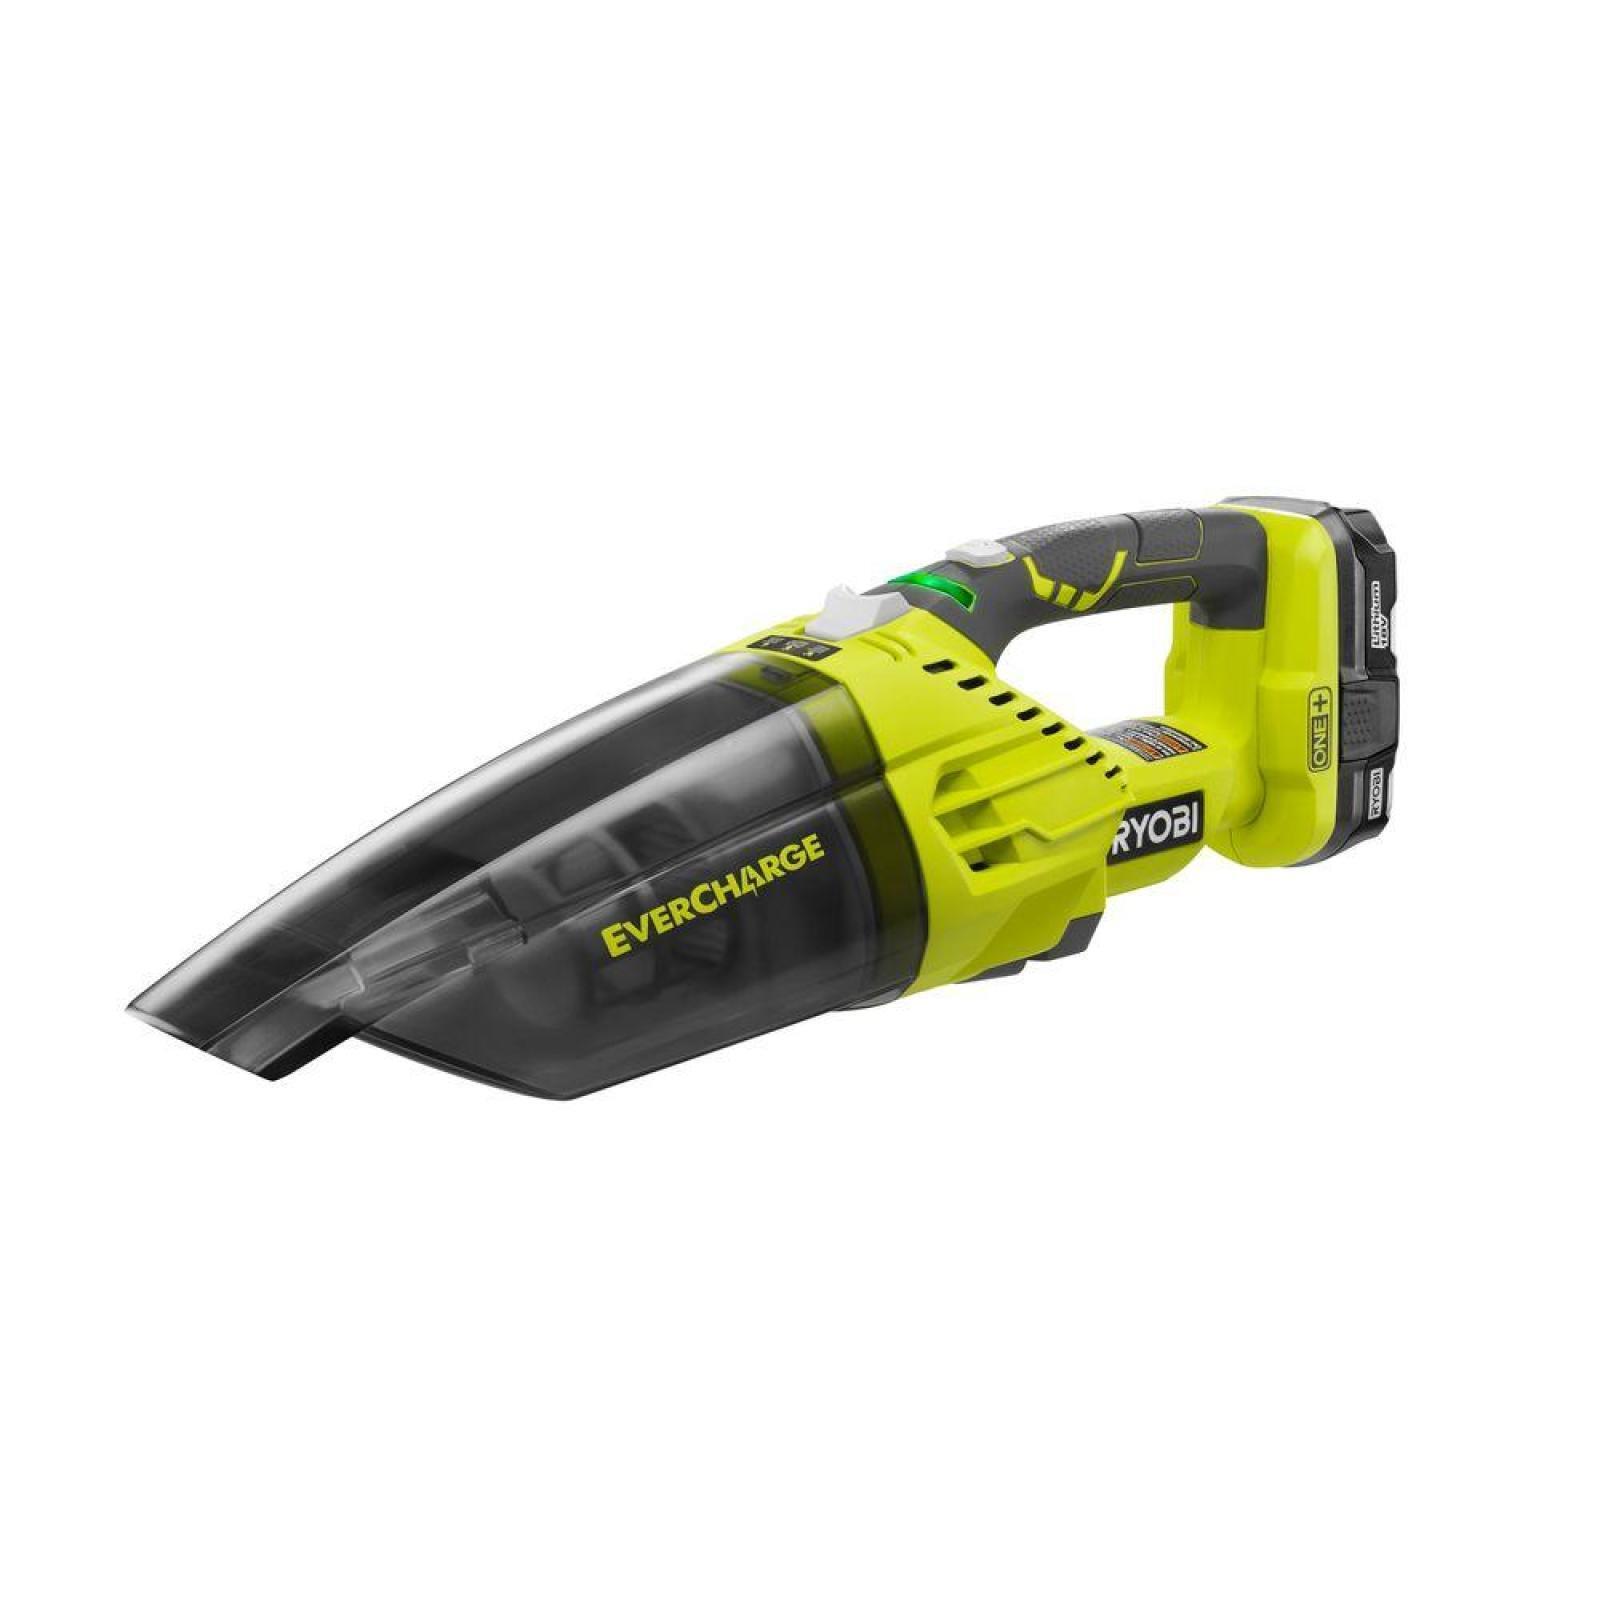 Ryobi Cordless Electric Handheld Hand Car Shop Vac Vacuum Carpet Power Tools New